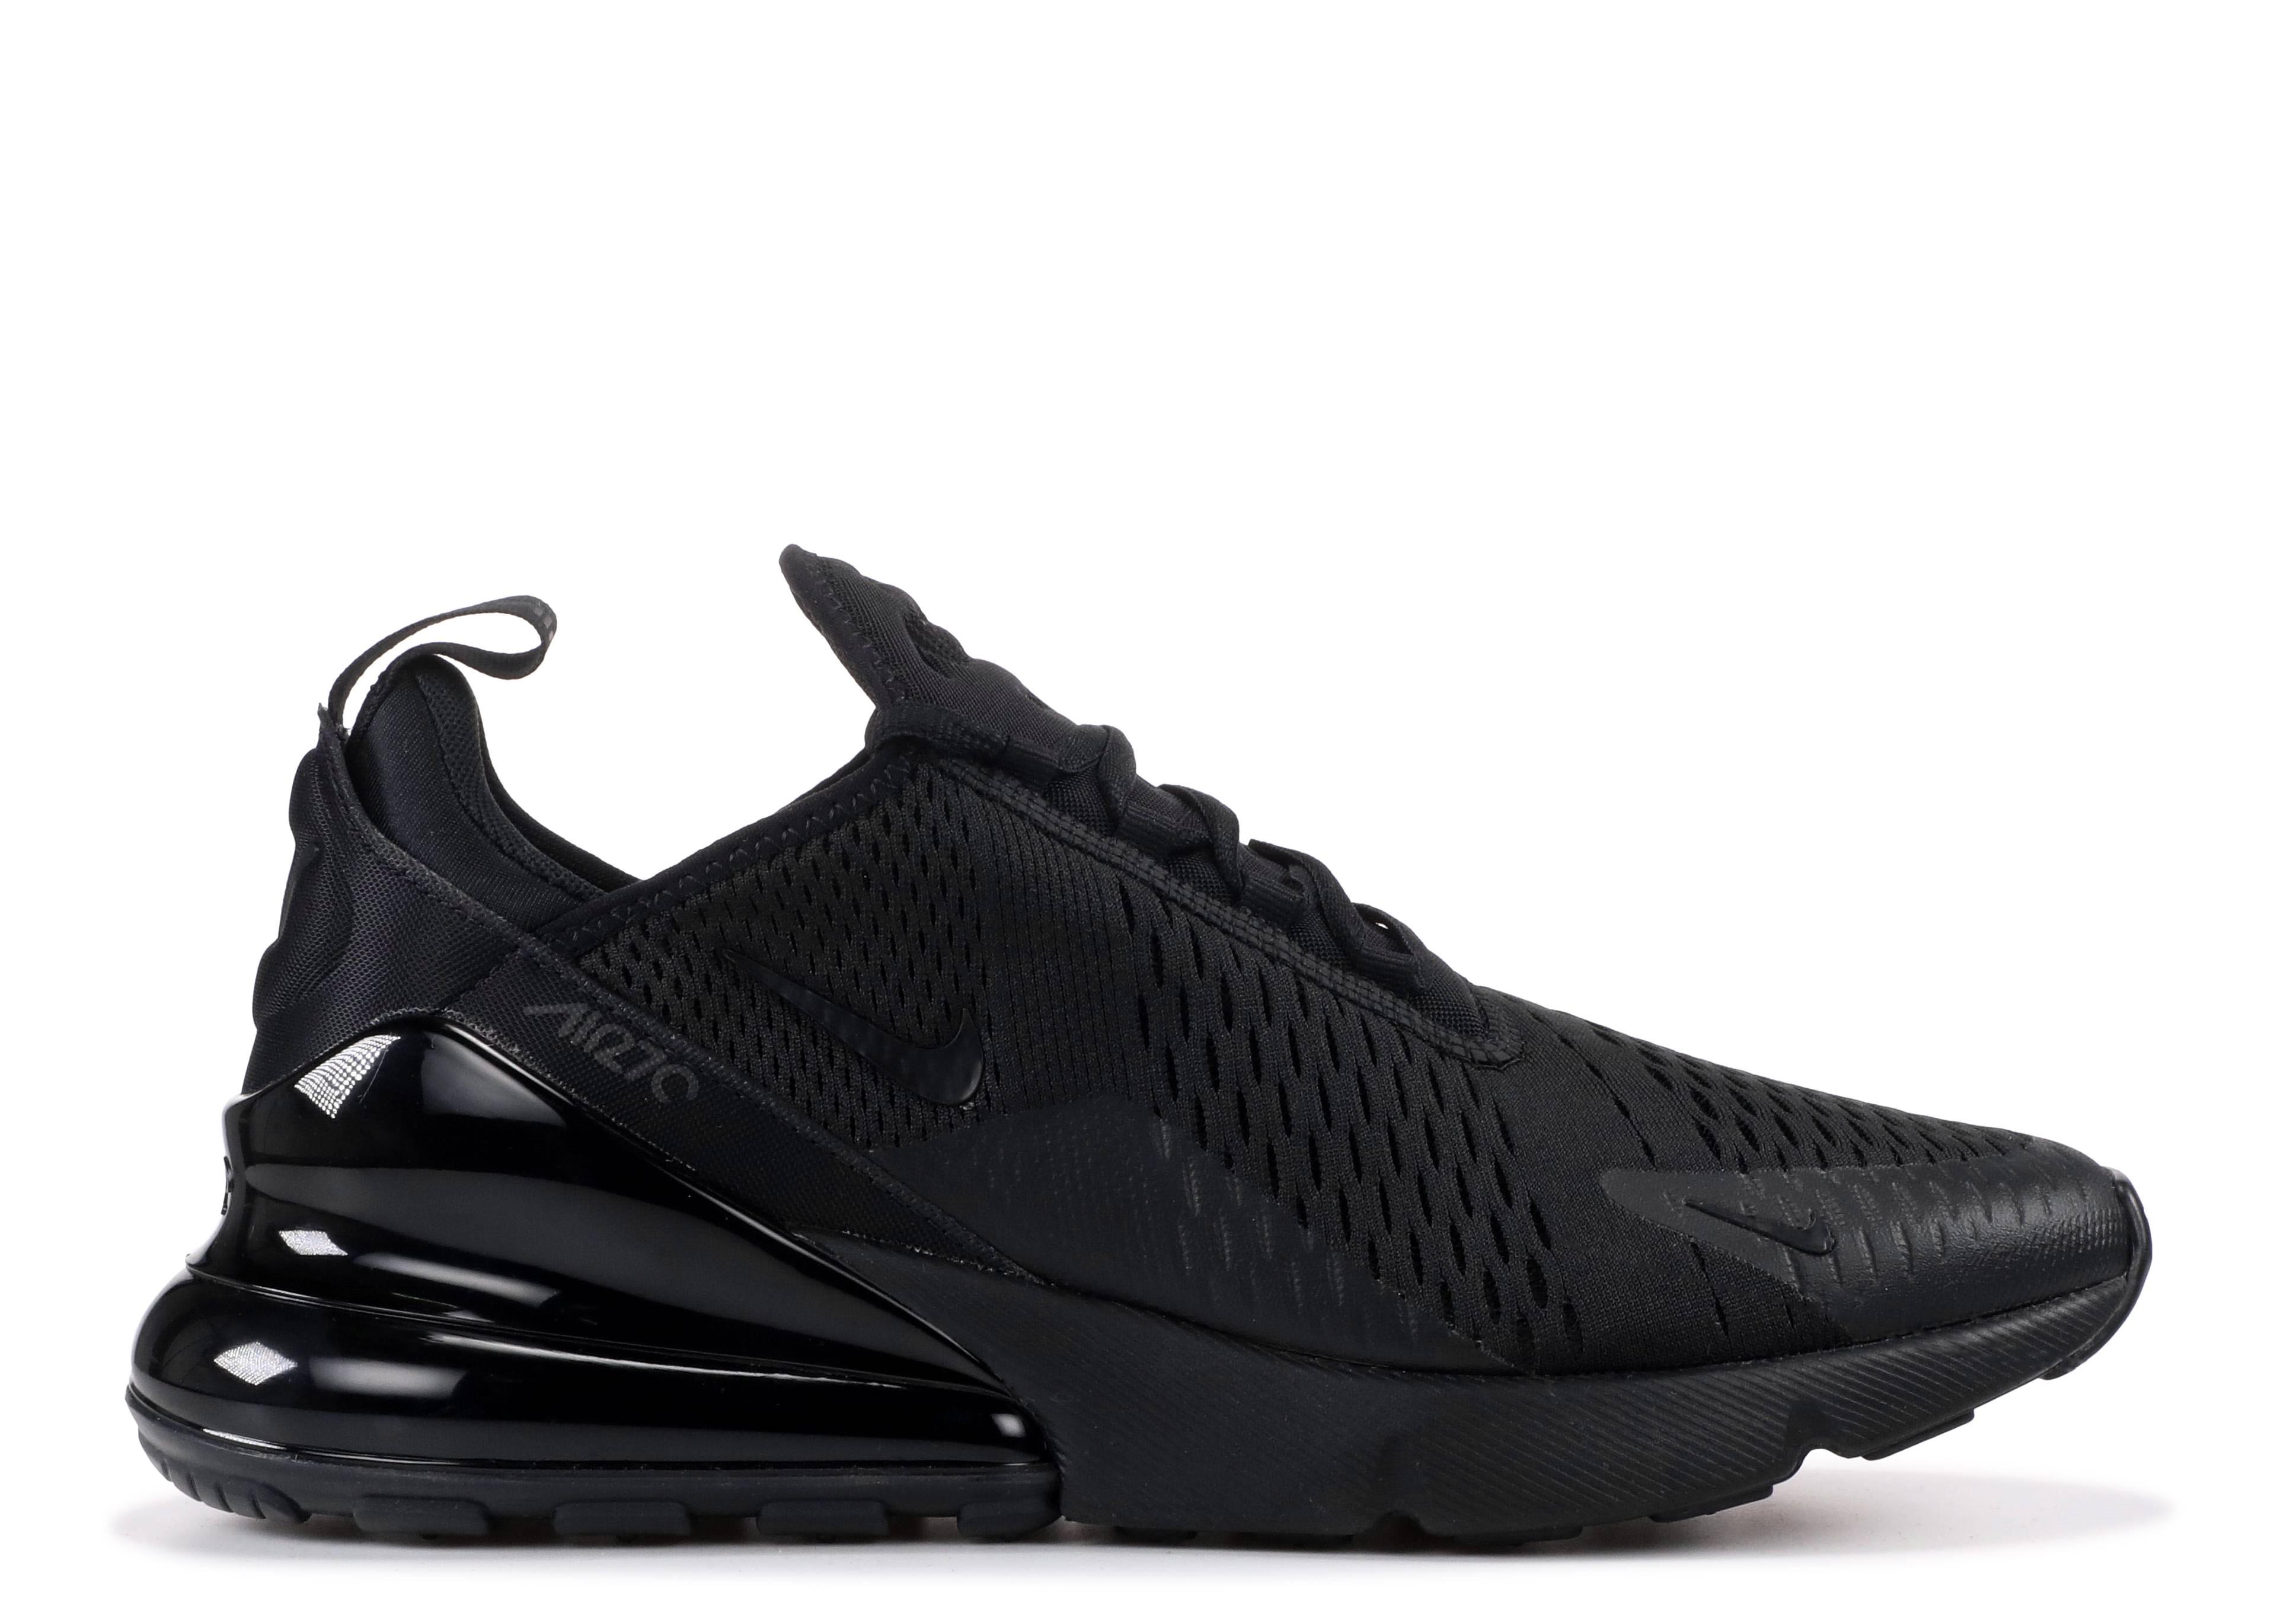 Palmadita descuento adoptar  Nike Air Max 270 Sneakers   Flight Club